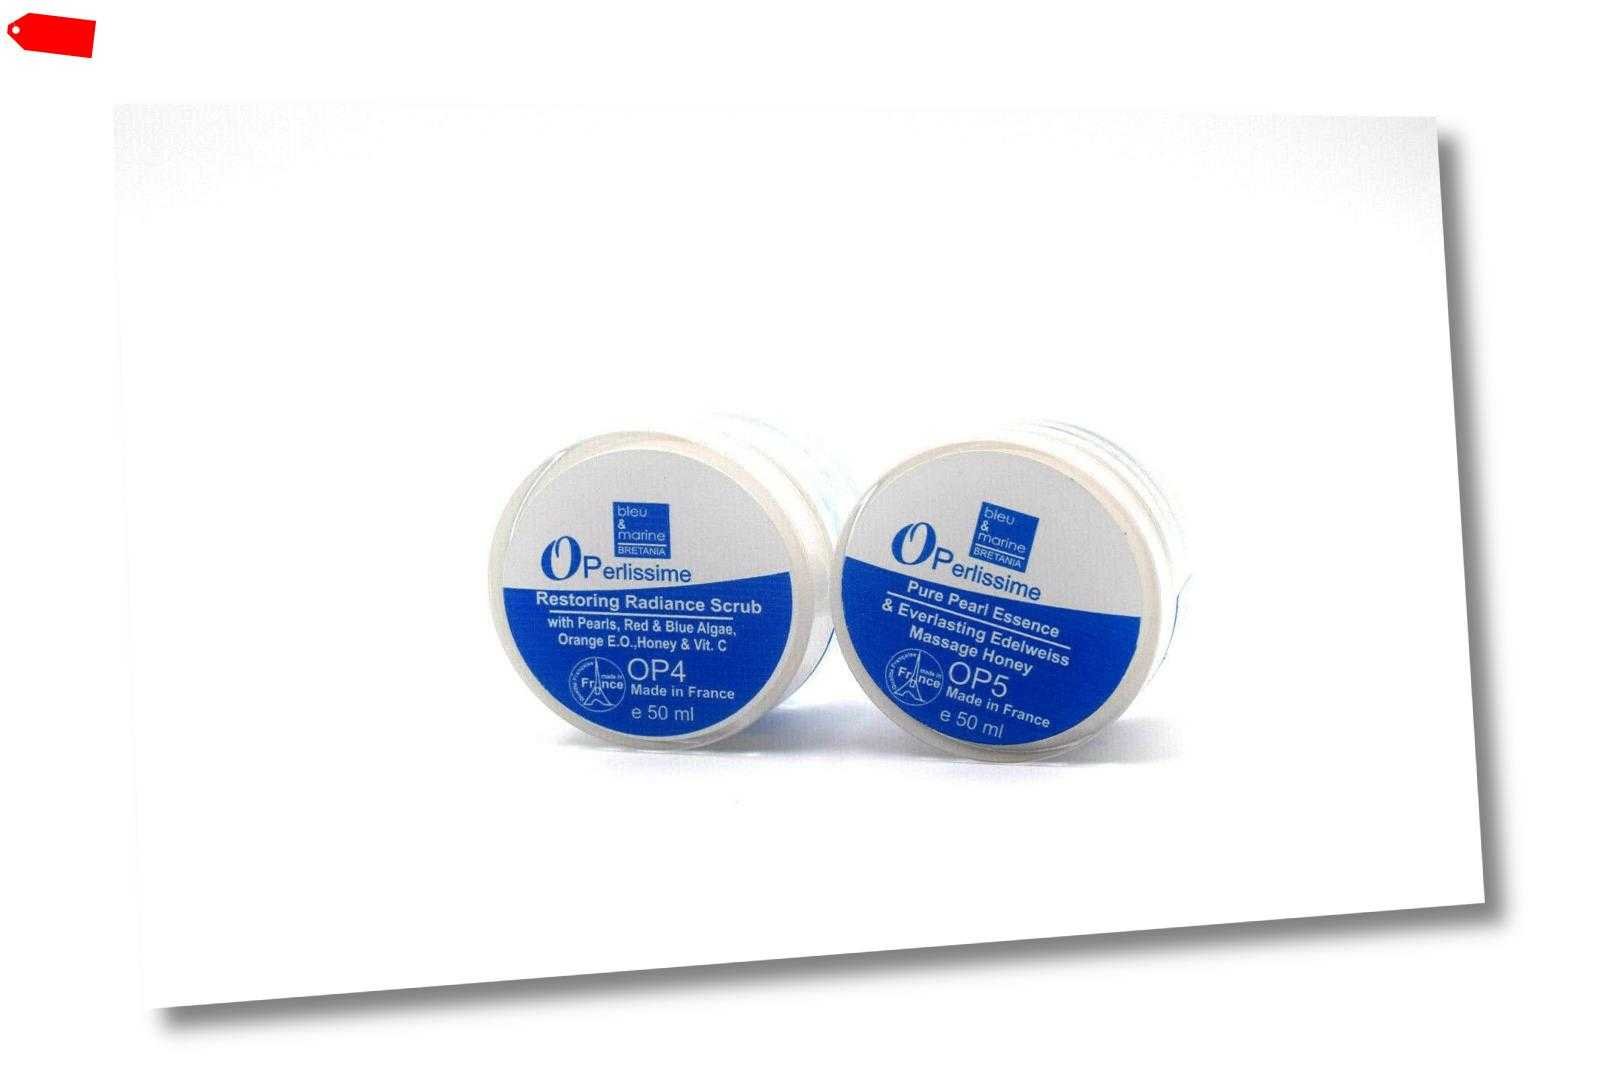 Operlissime Radiance Scrub OP4 50ml + Perlenessenz Massage Honig OP5 50ml